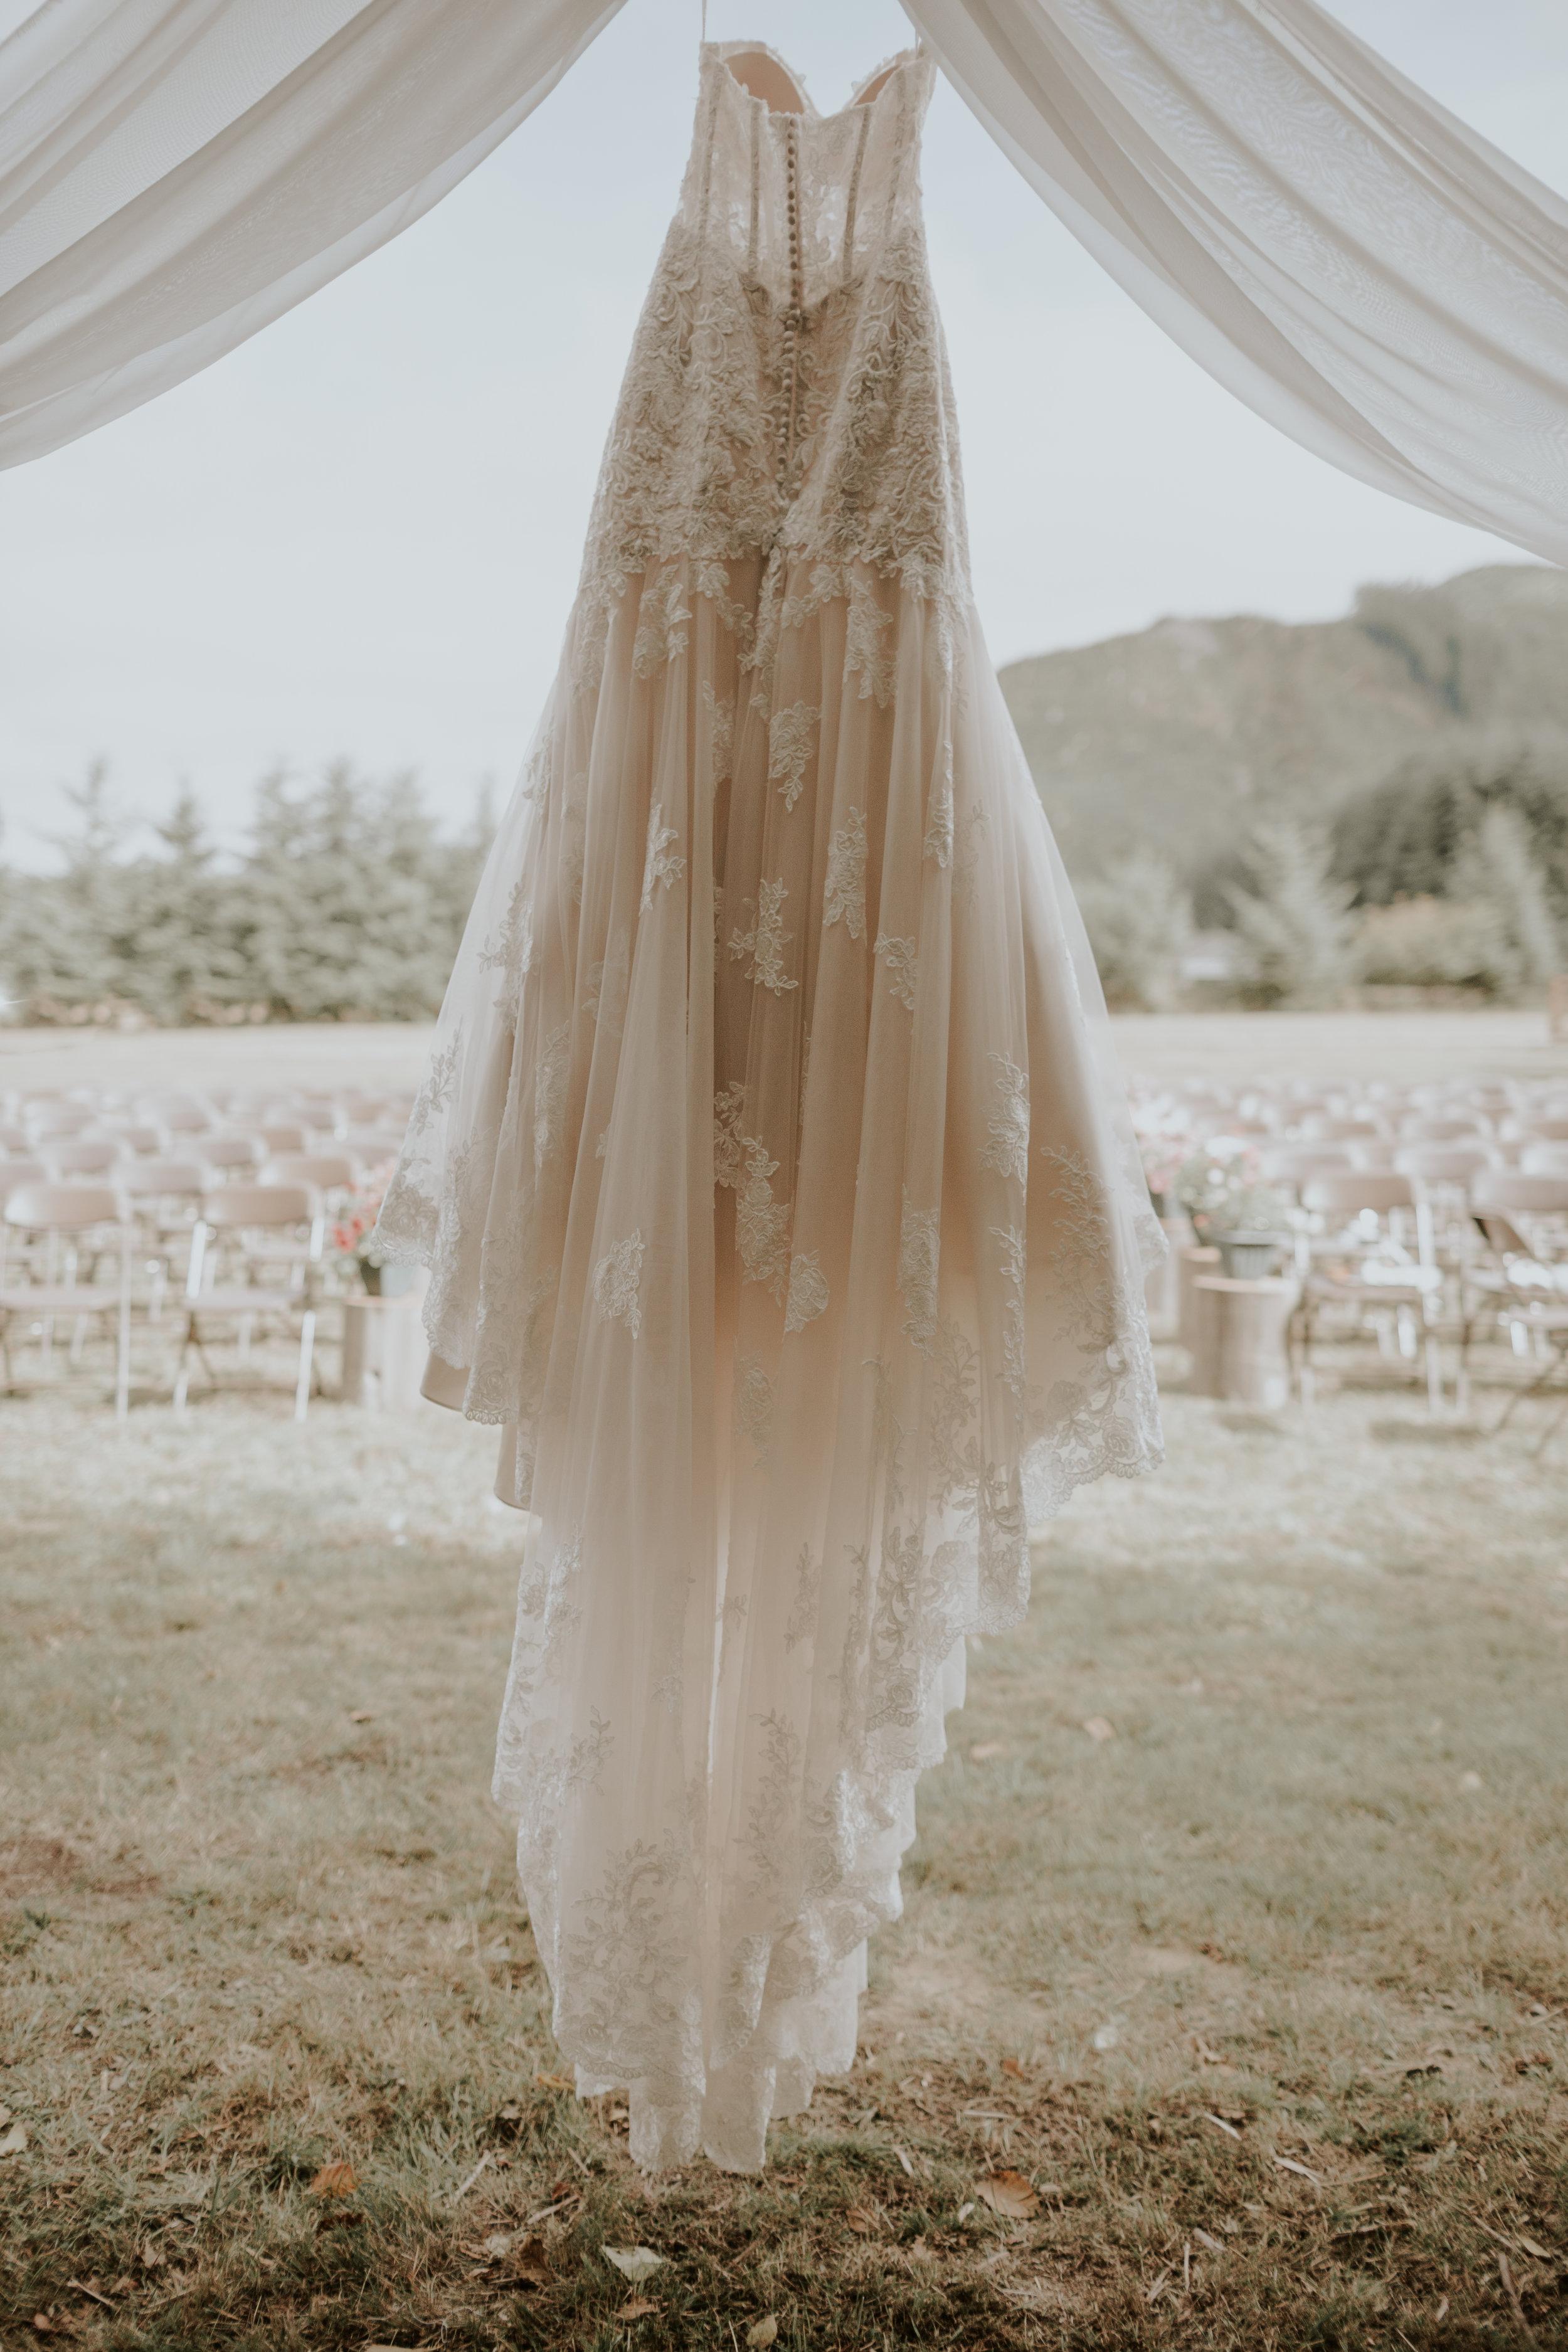 Olympic-Peninsula-Wedding-Photographer-PNW-Forks-Port-Angeles-Kayla-Dawn-Photography-engagement-Olympic-National-Park-76.jpg